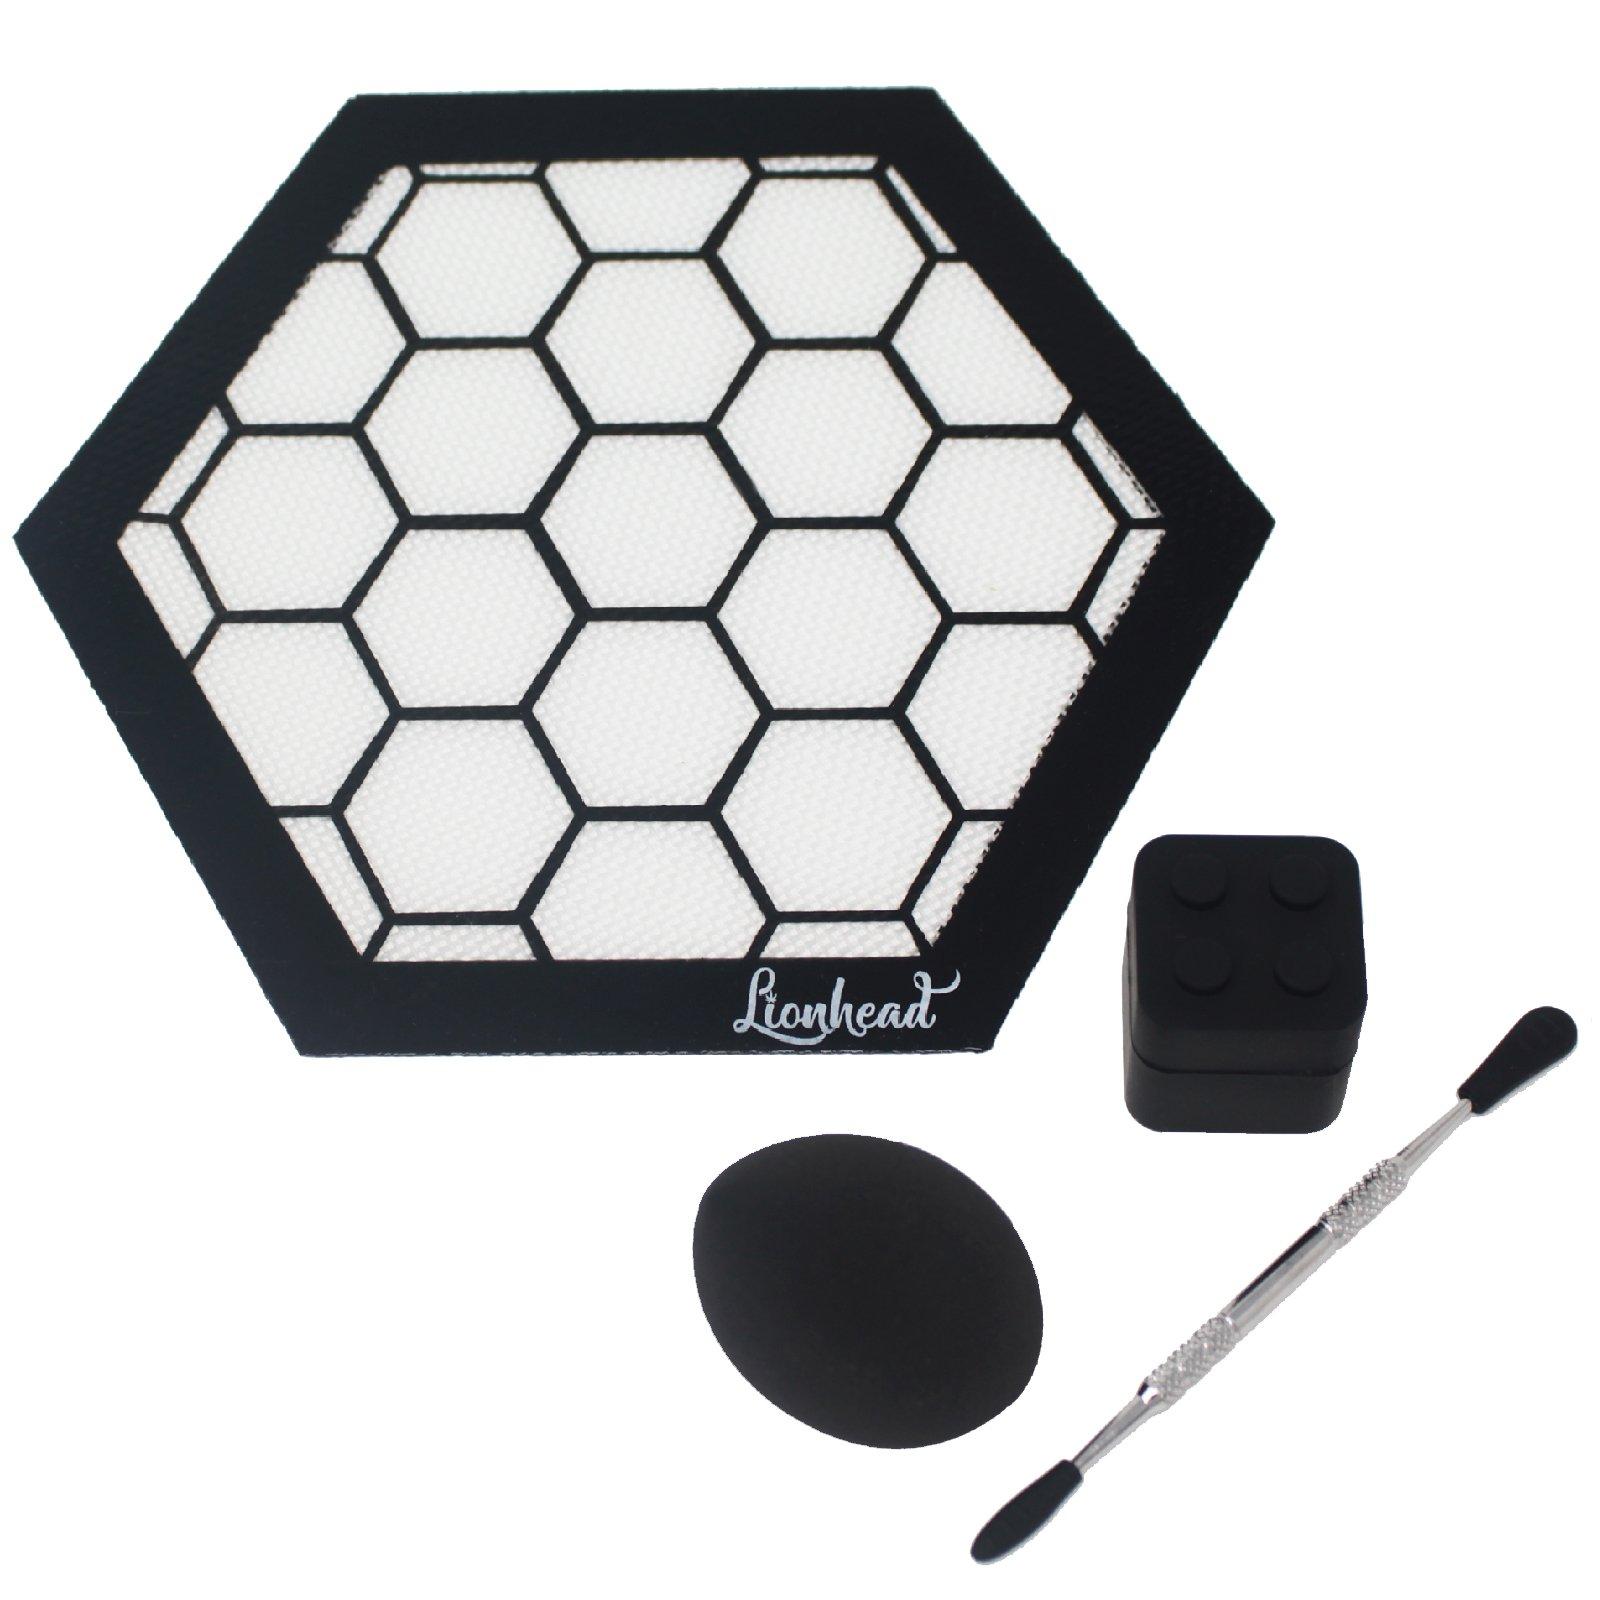 Silicone Mat Bundle - 8'' Hexagon Mat + 5'' Carving Tool + 7ml Non-Stick Container + Sponge - Lionhead (Honeycomb)